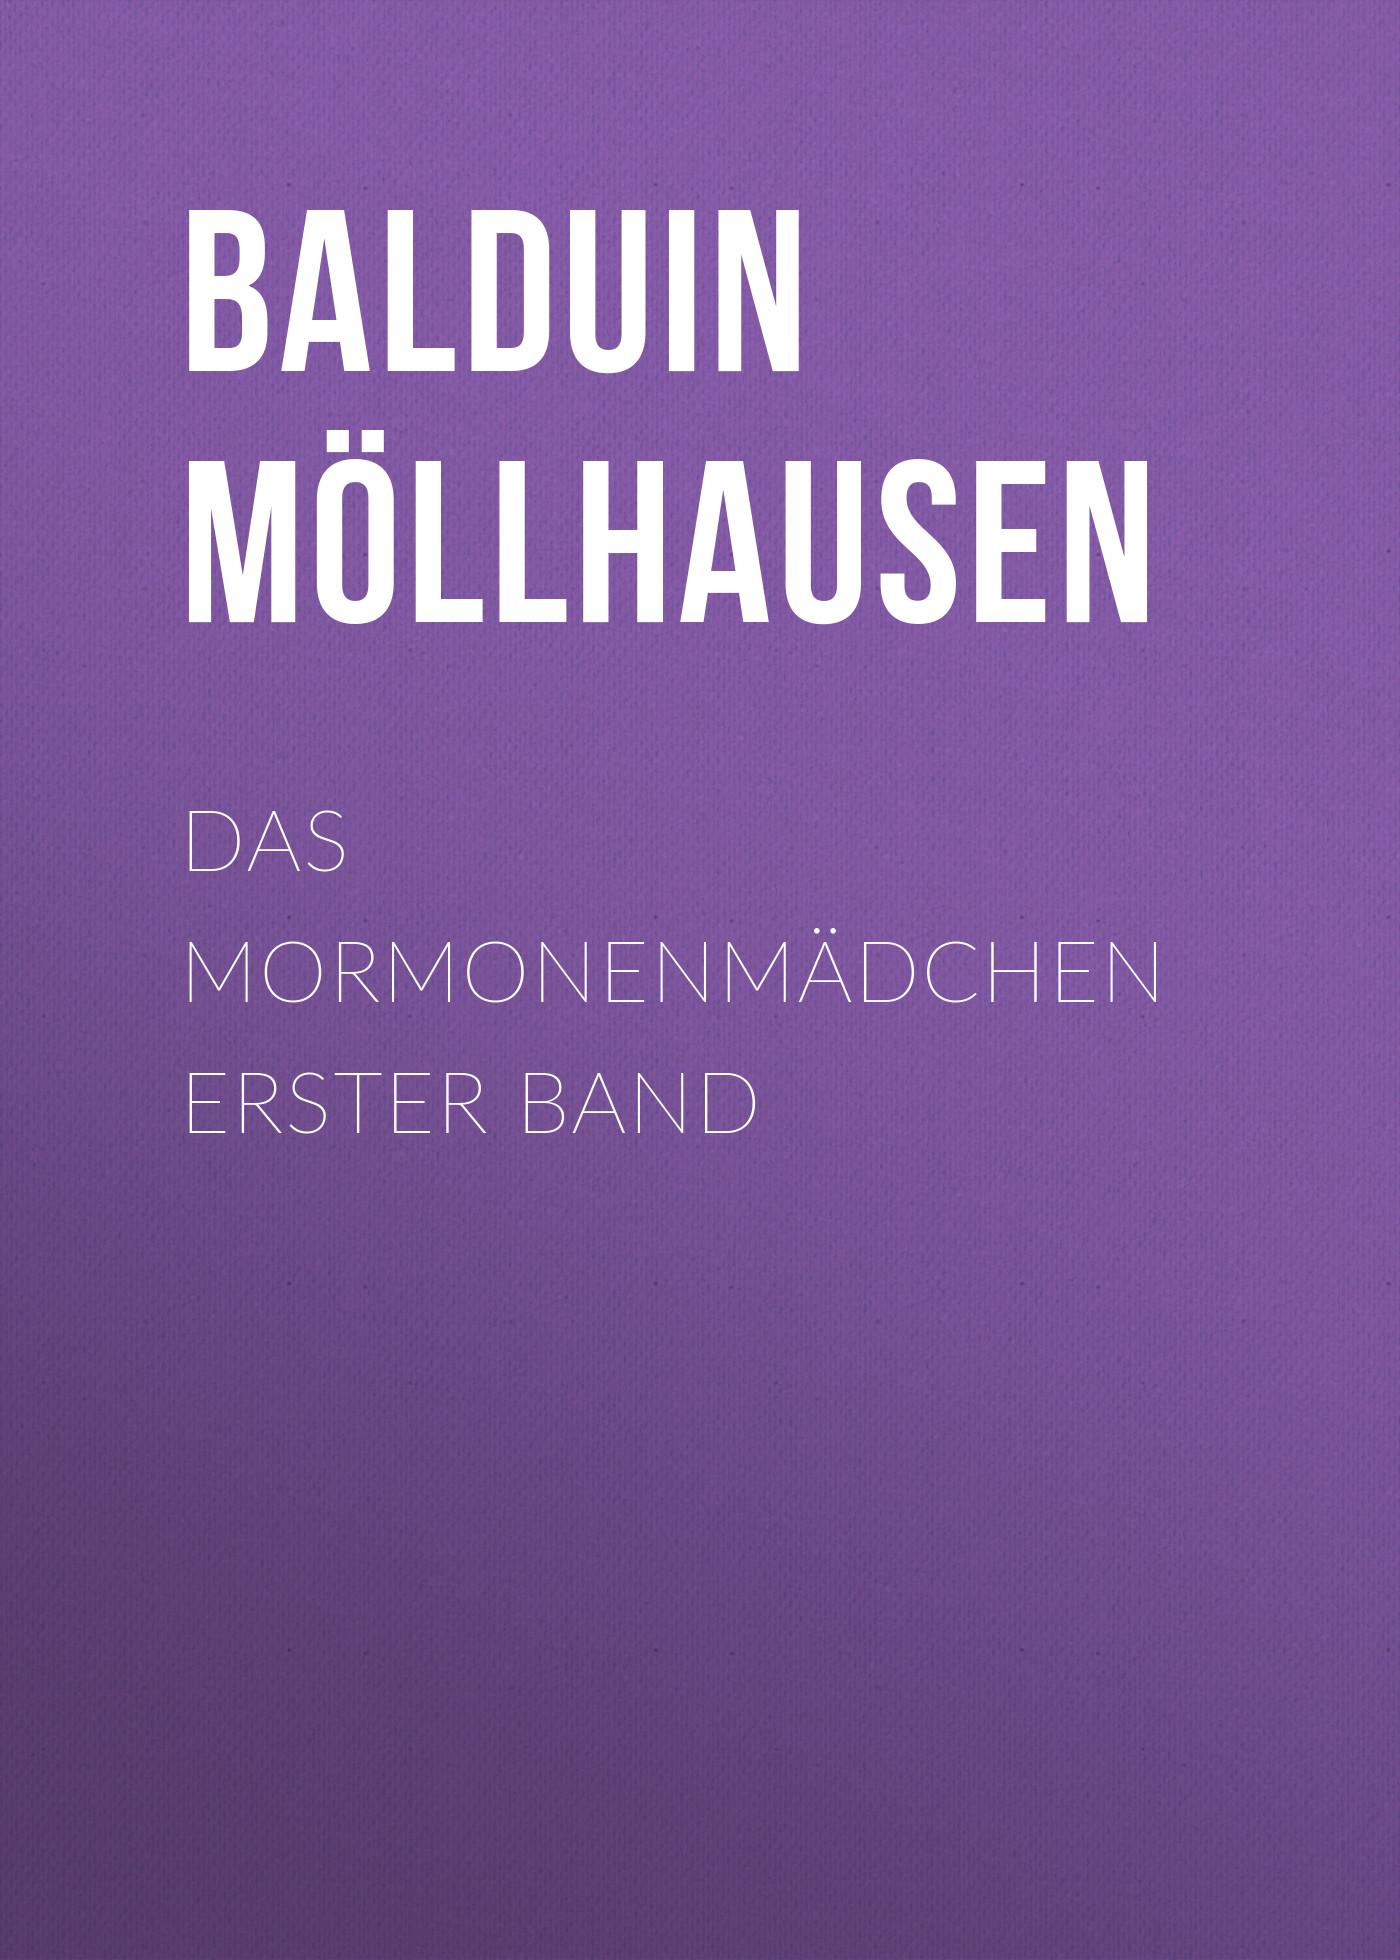 Balduin Möllhausen Das Mormonenmädchen Erster Band